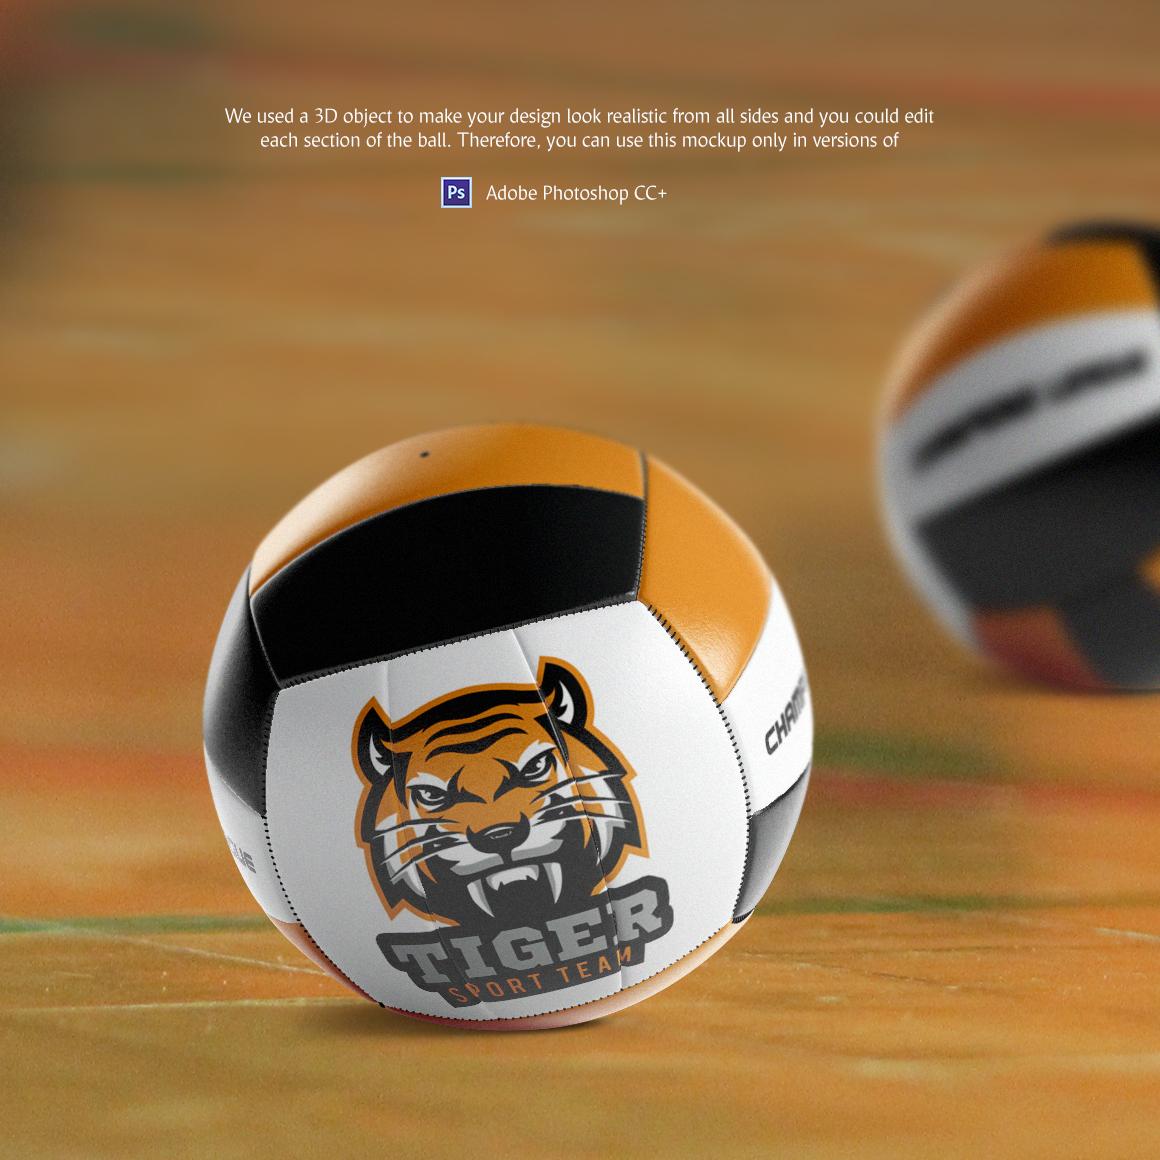 Volleyball Ball Animated Mockup example image 2